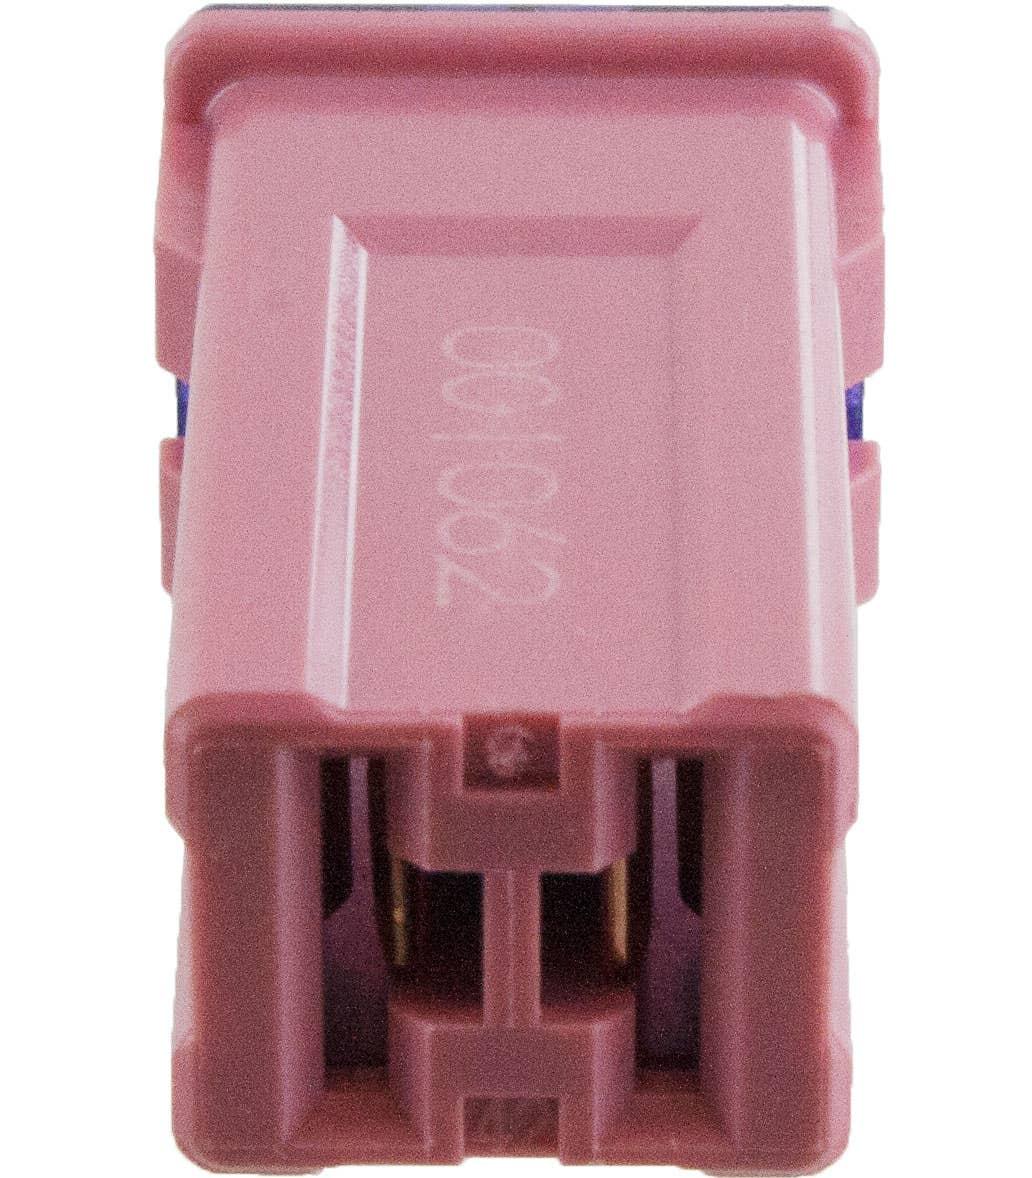 30 Amp Fls Cartridge Fuse Pink Bulk 25pk Elecdirect Micro Block With Box Lug